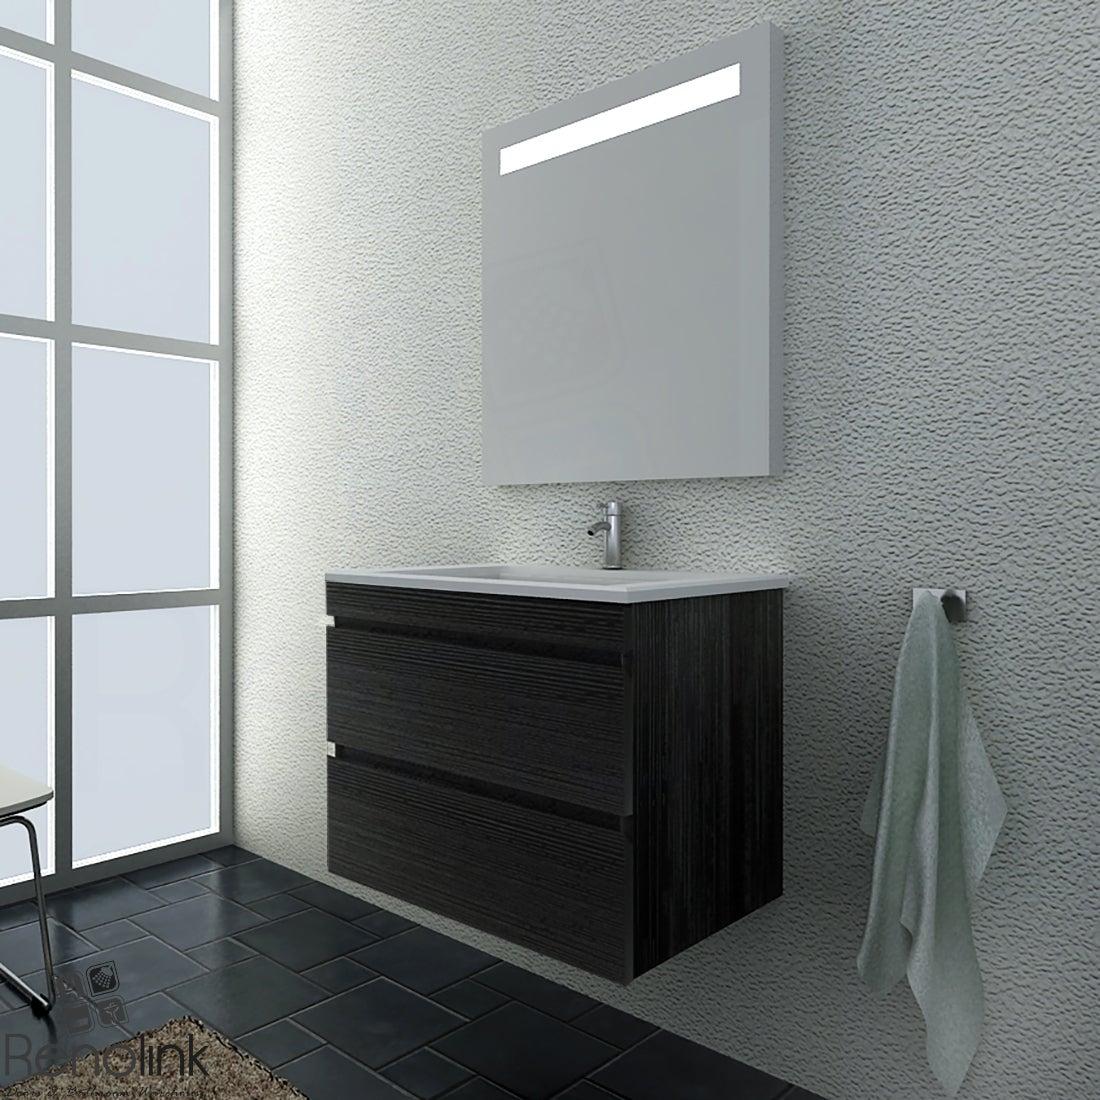 Renolink Vellena 600mm Charcoal Grey Wall Hung Bathroom Vanity Cabinet